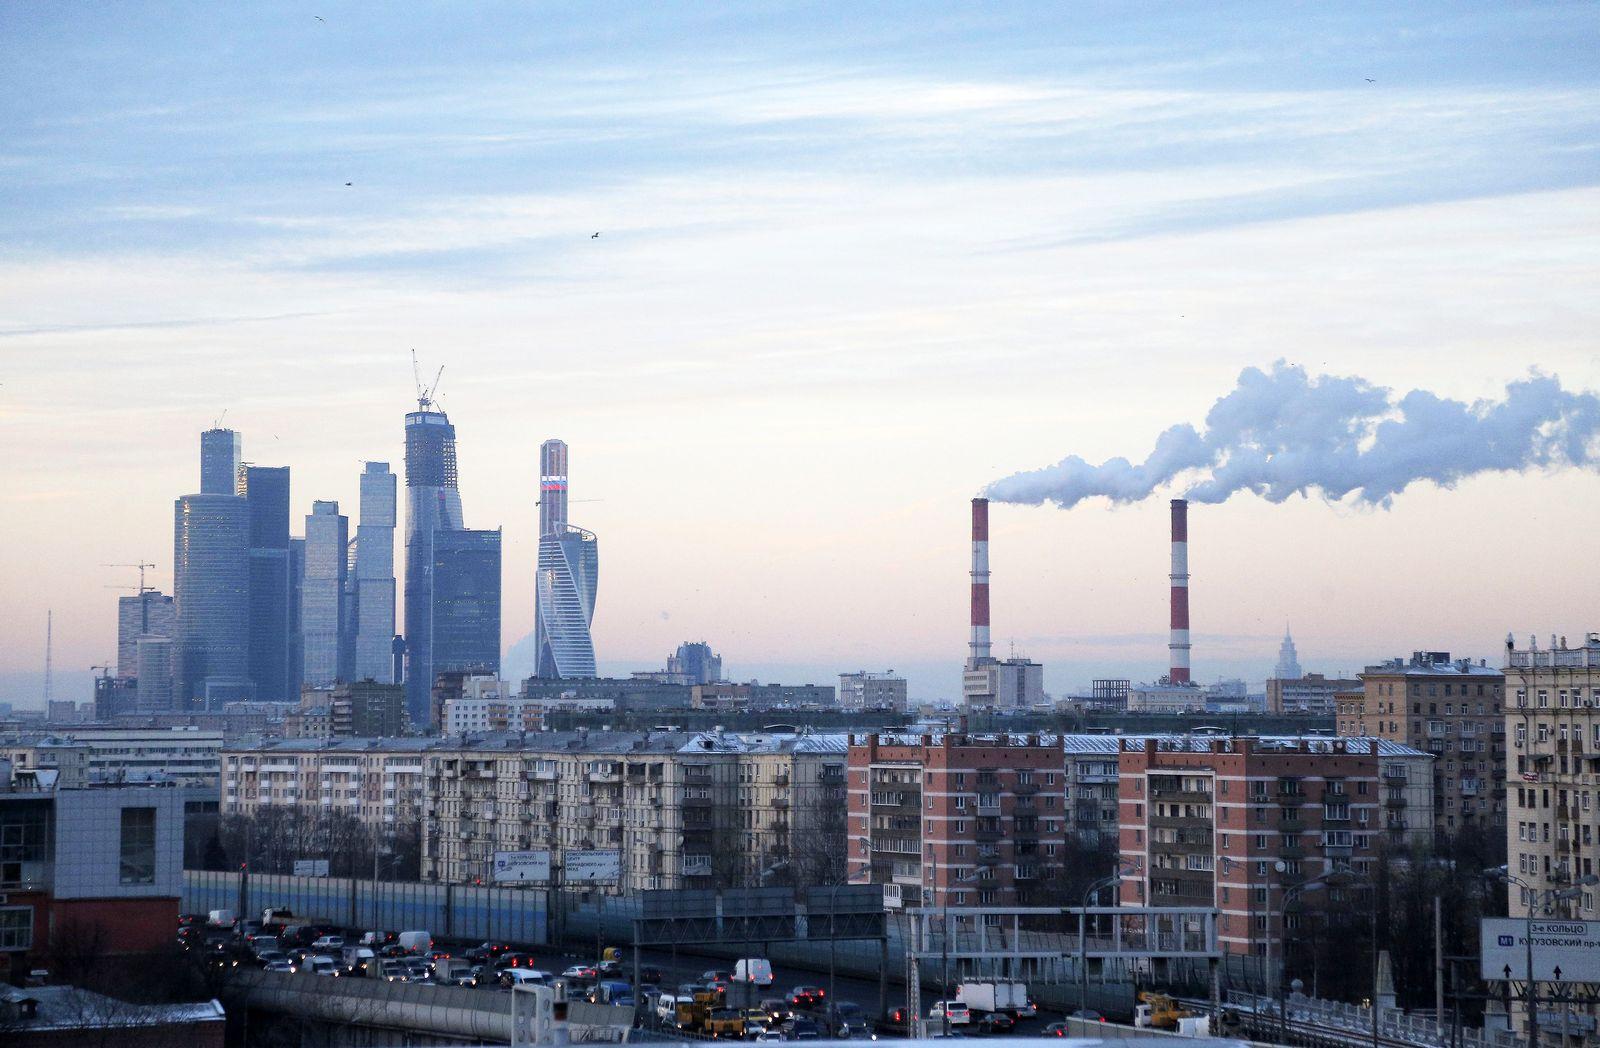 Moscow Business Centre, Moskva City